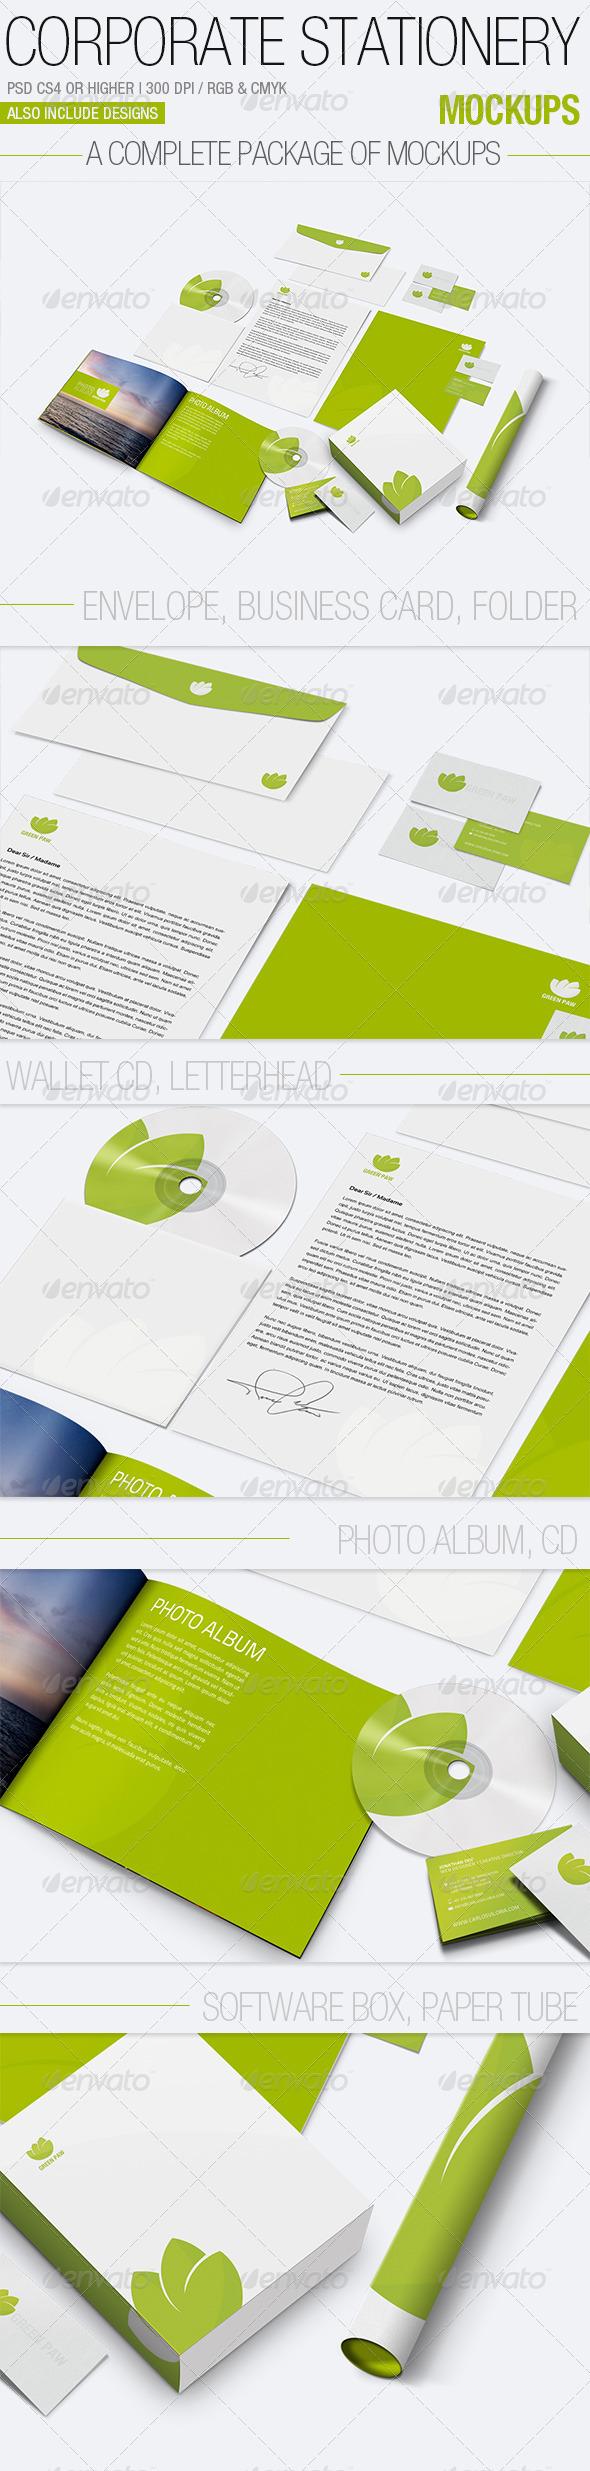 GraphicRiver Corporate Stationery Mockups 2409793